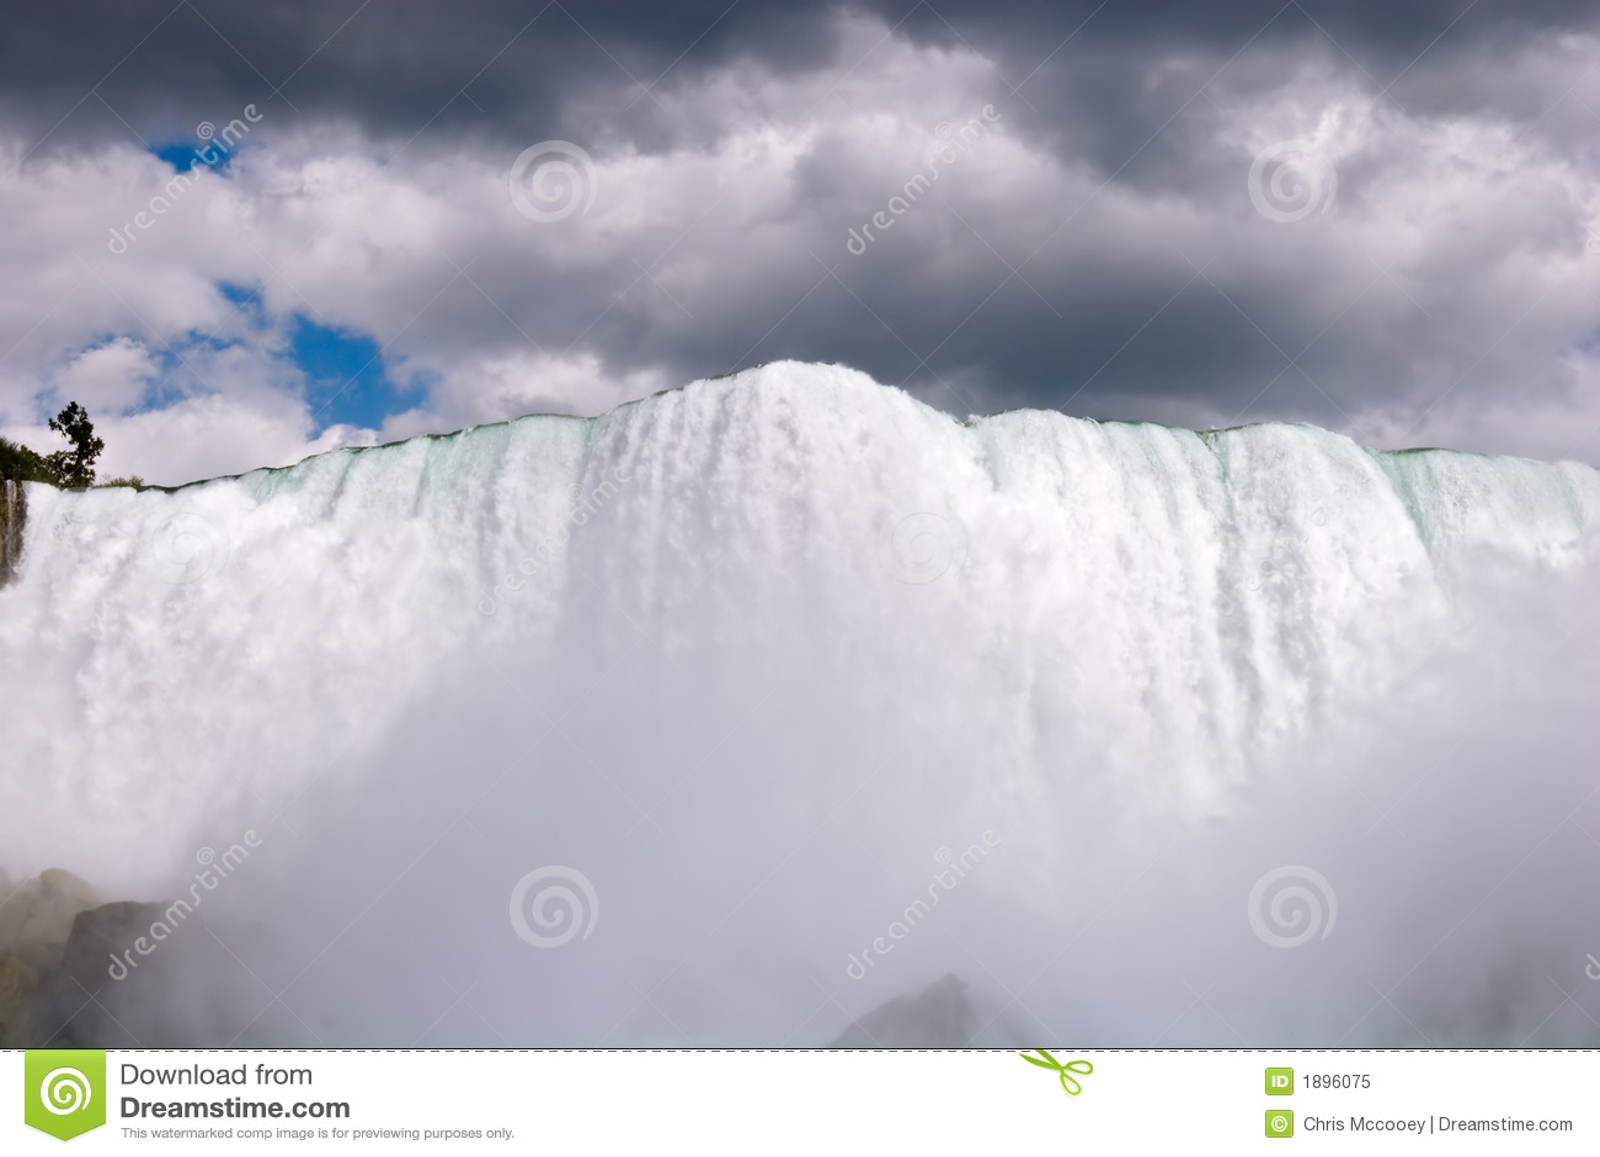 Wielki wodospad Niagara